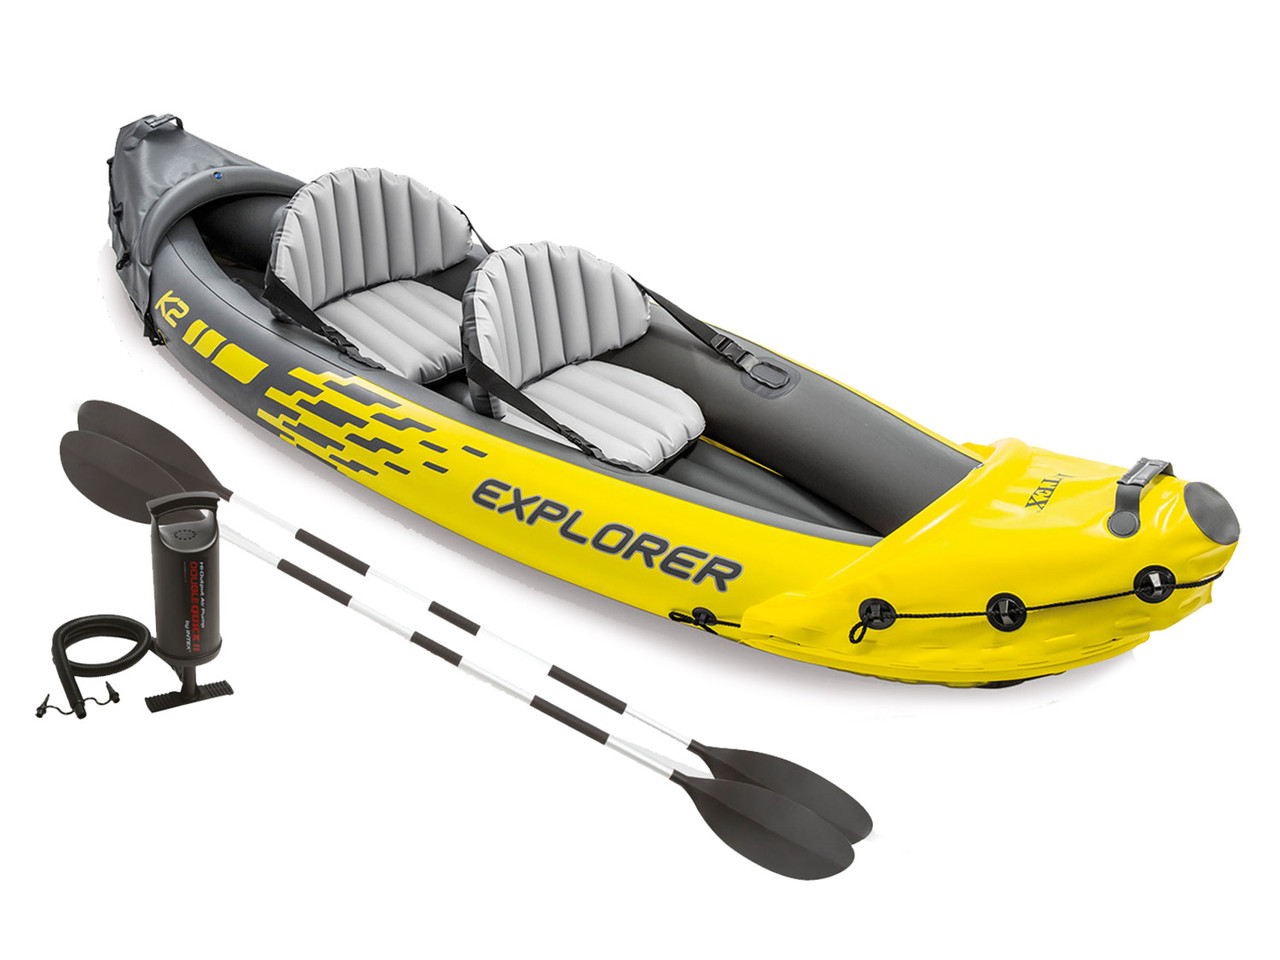 Надувная байдарка Explorer K2 312 x 91 x 51 см INTEX 68307